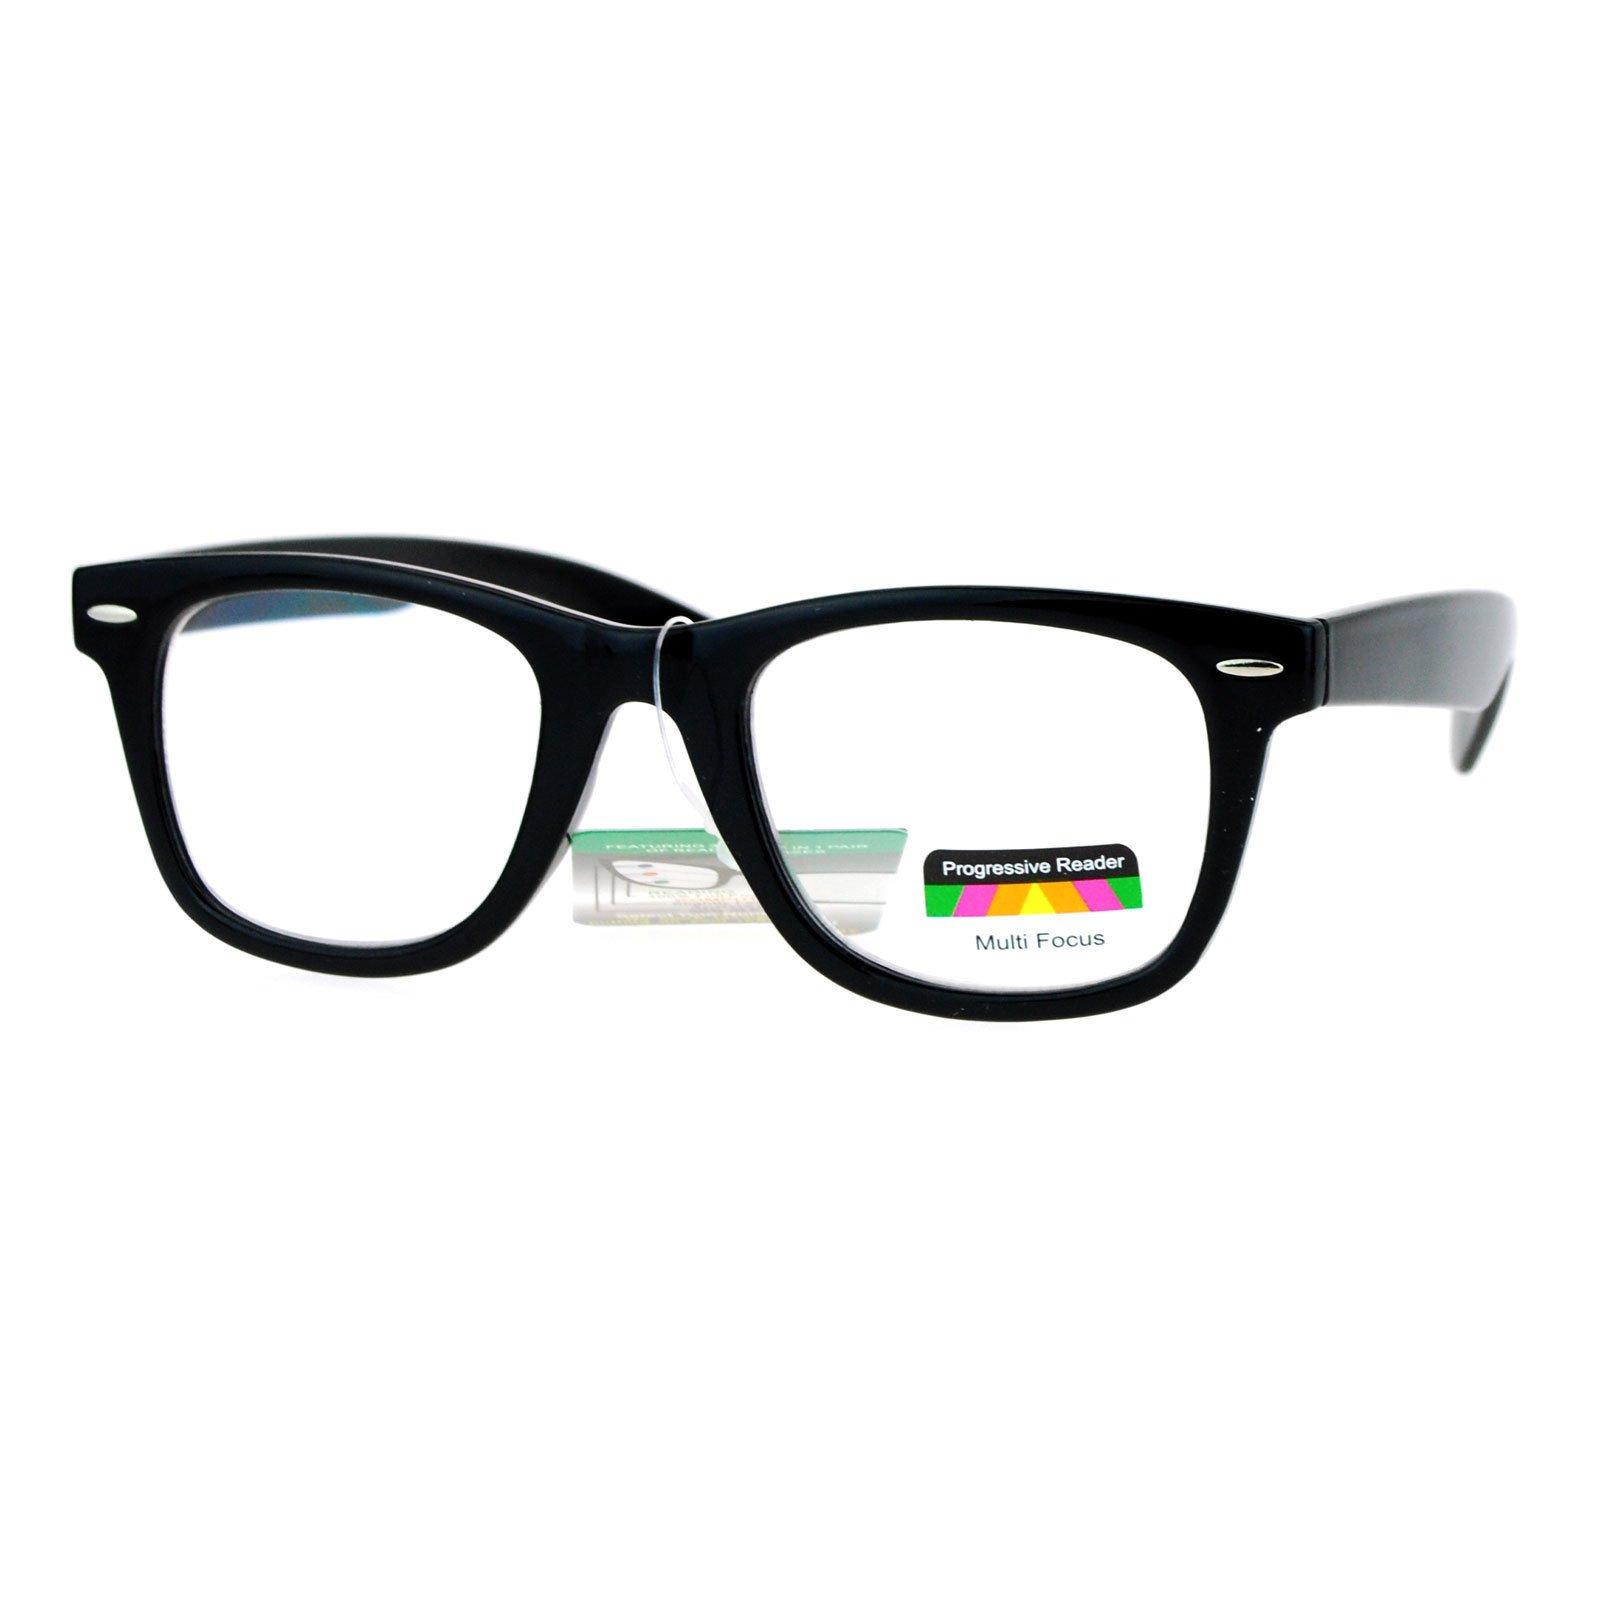 Multi Focus Progressive Reader Glasses 3 Powers in 1 Square Horn Rim Black +2.50